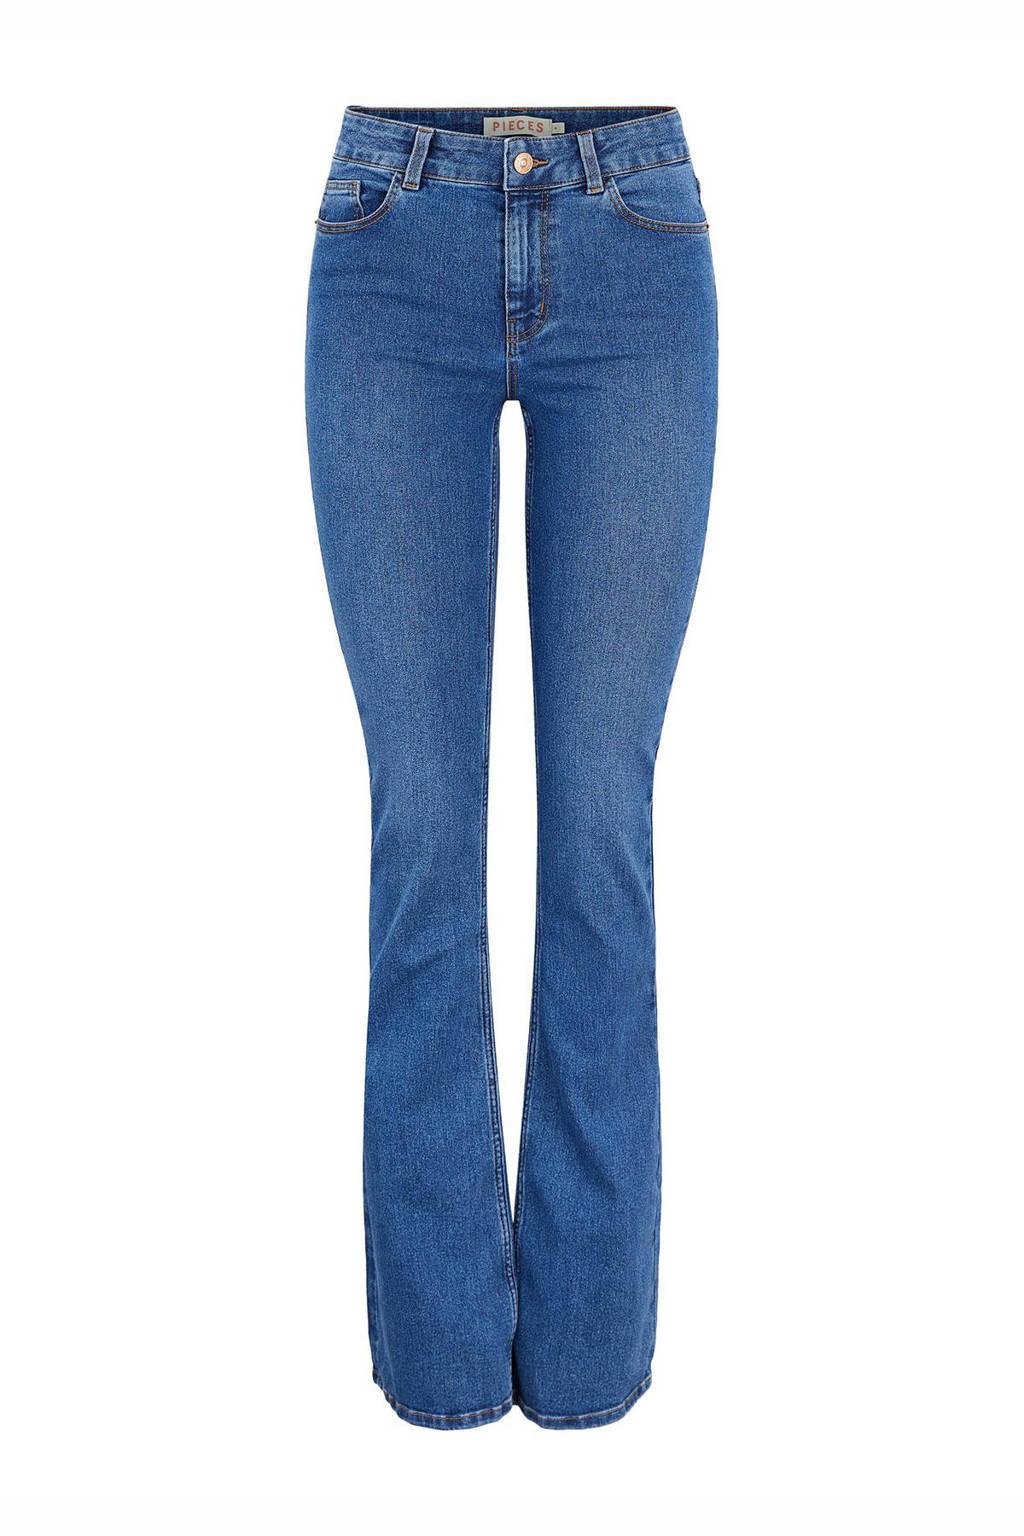 PIECES flared jeans PCPEGGY medium blue denim, Blauw